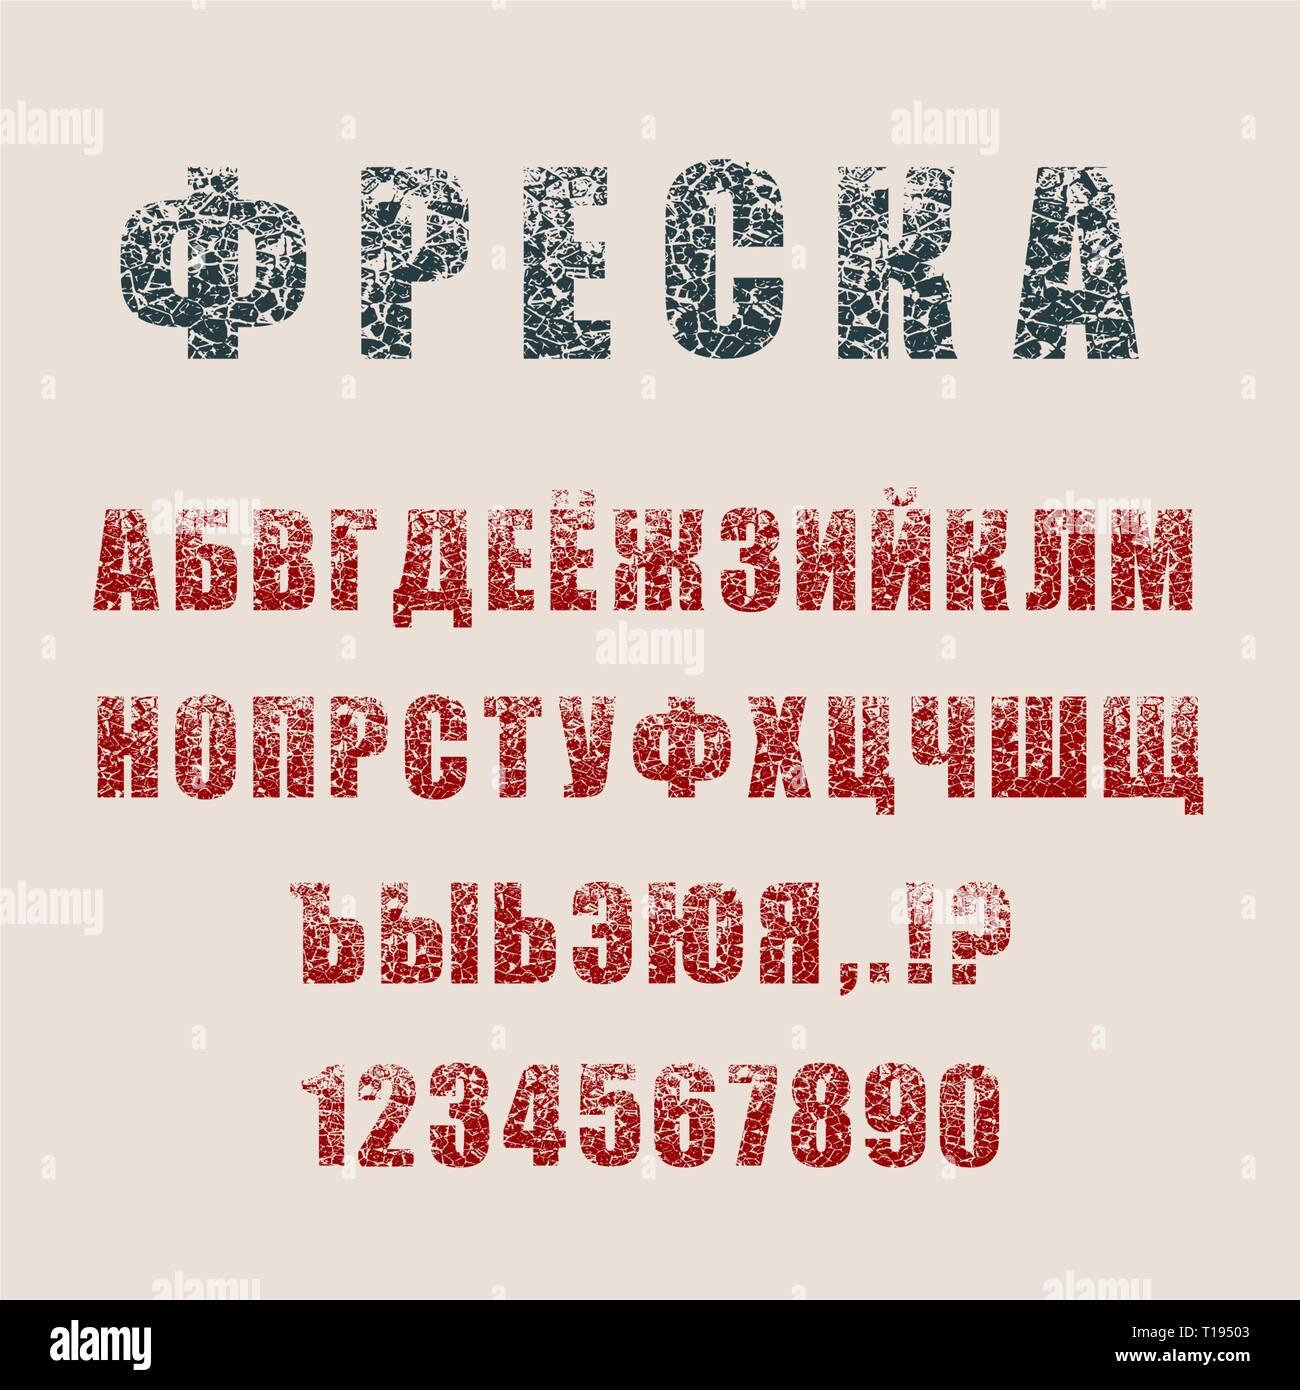 b8ff10e3312 Cyrillic Font Stock Photos & Cyrillic Font Stock Images - Alamy